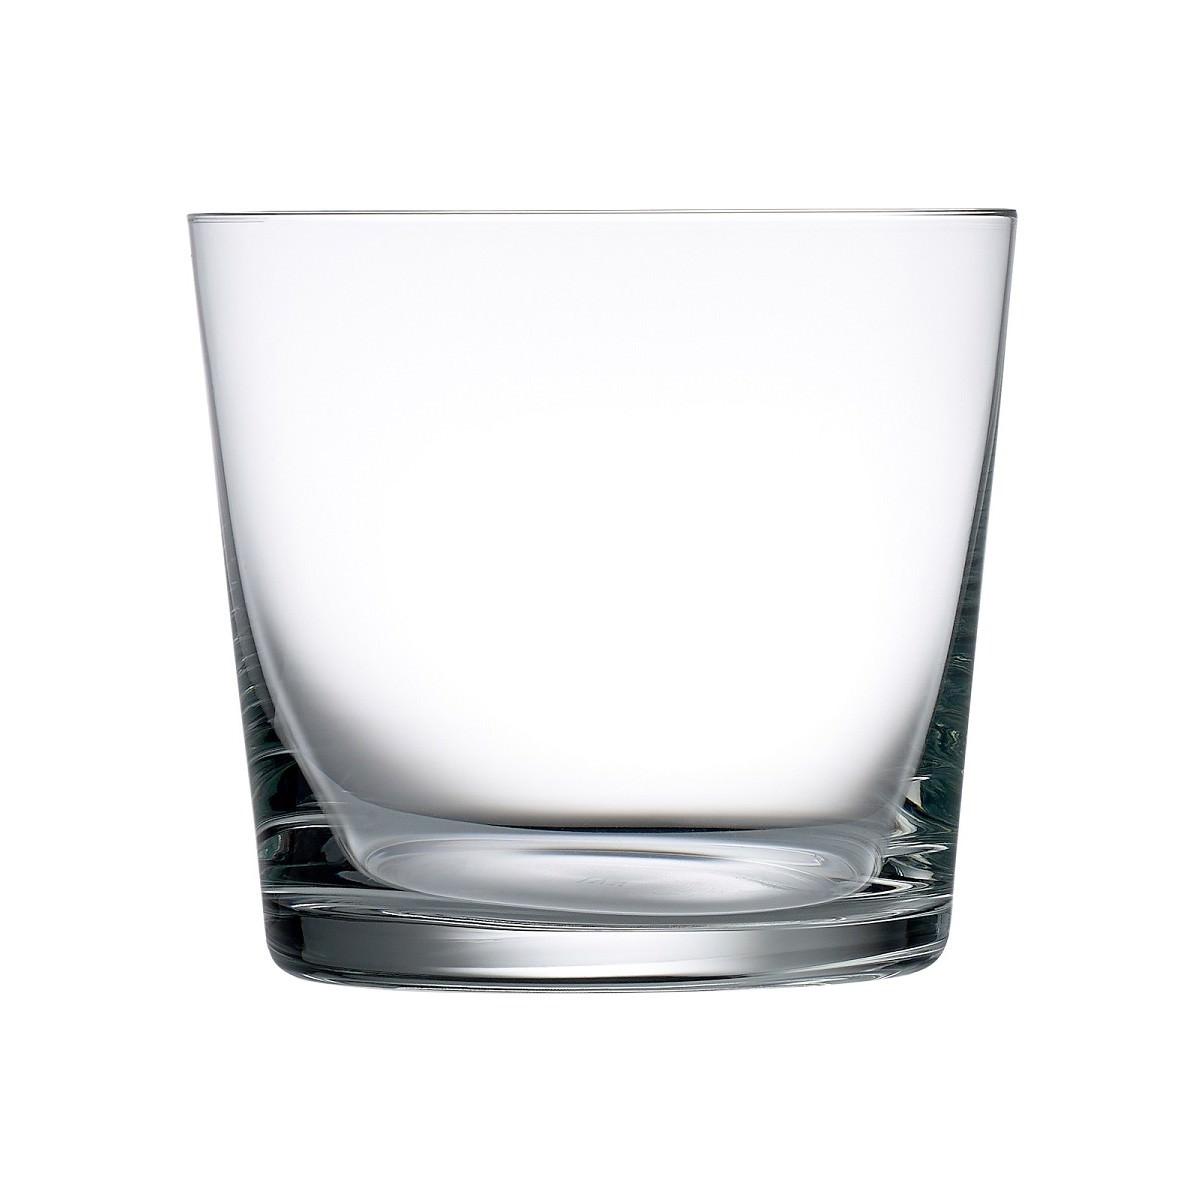 IVV Acquacheta Glass Tumbler, Set of 6